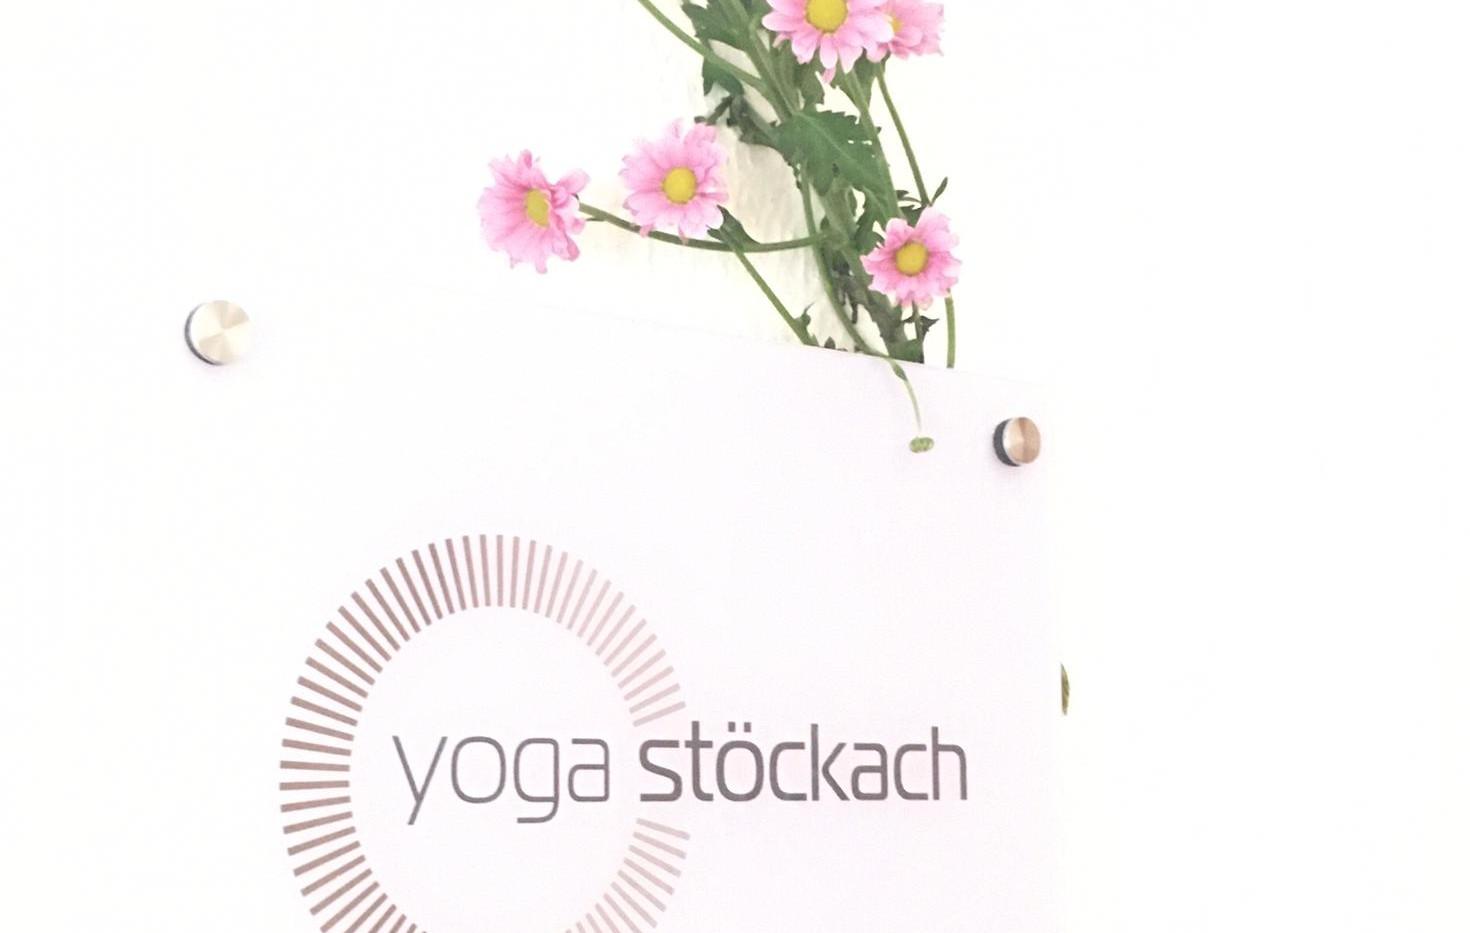 Yoga Stöckach